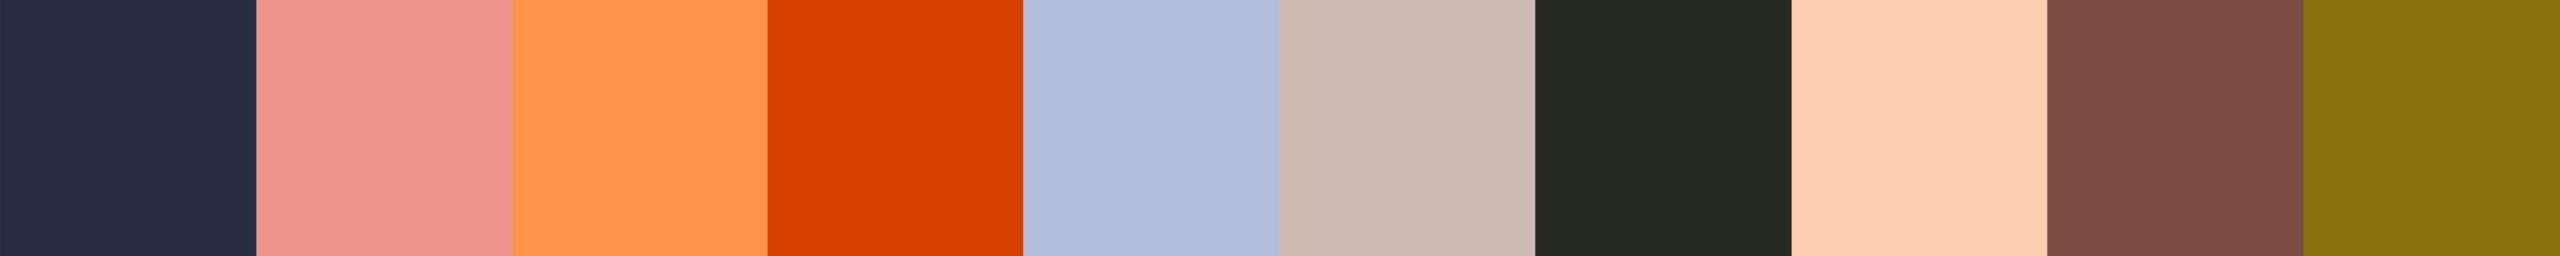 211 Egramia Color Palette